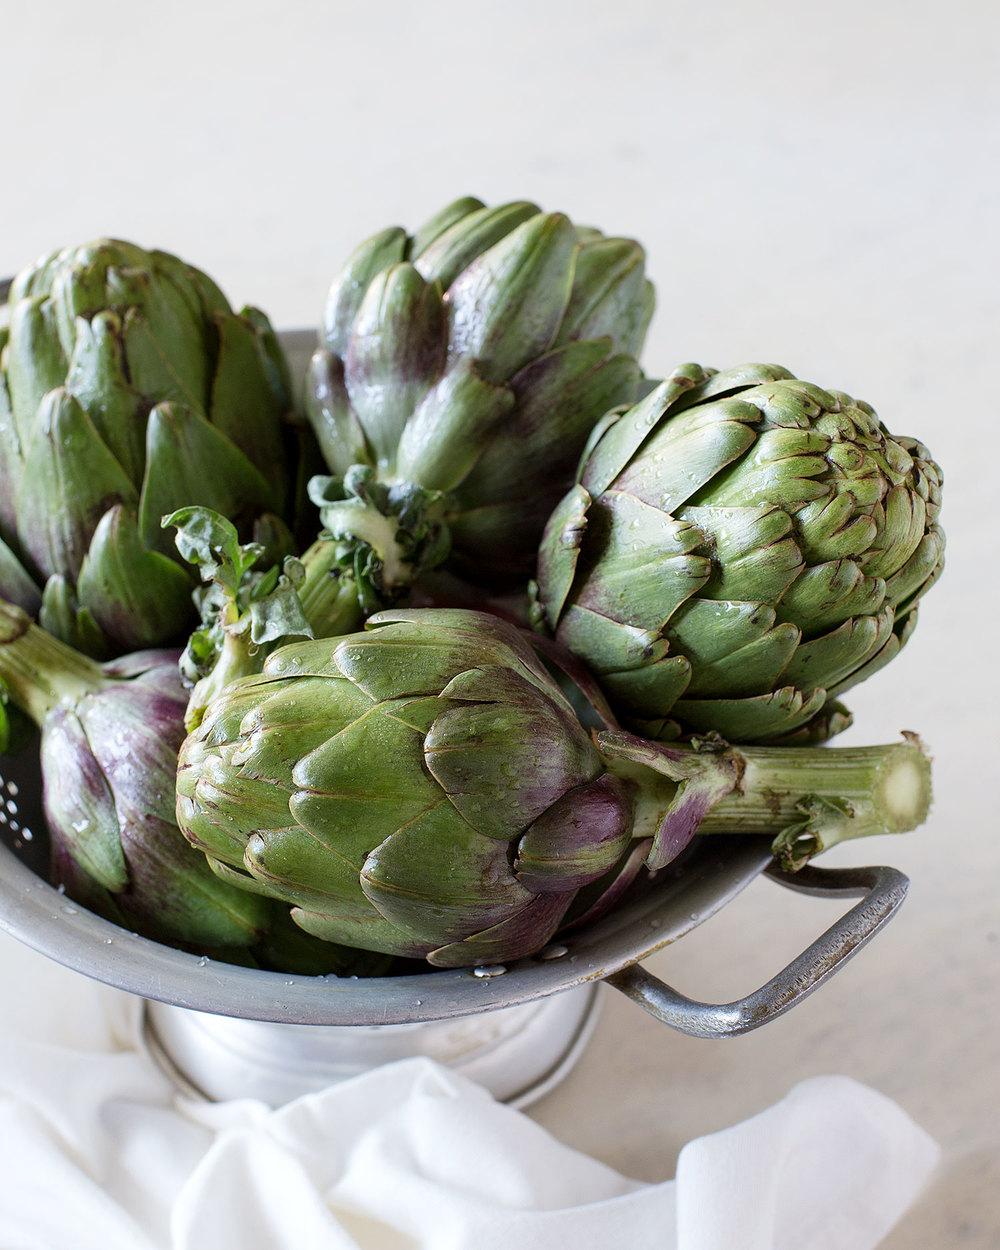 corina-landa-food-photography-fotografia-gastronomica-0177.jpg